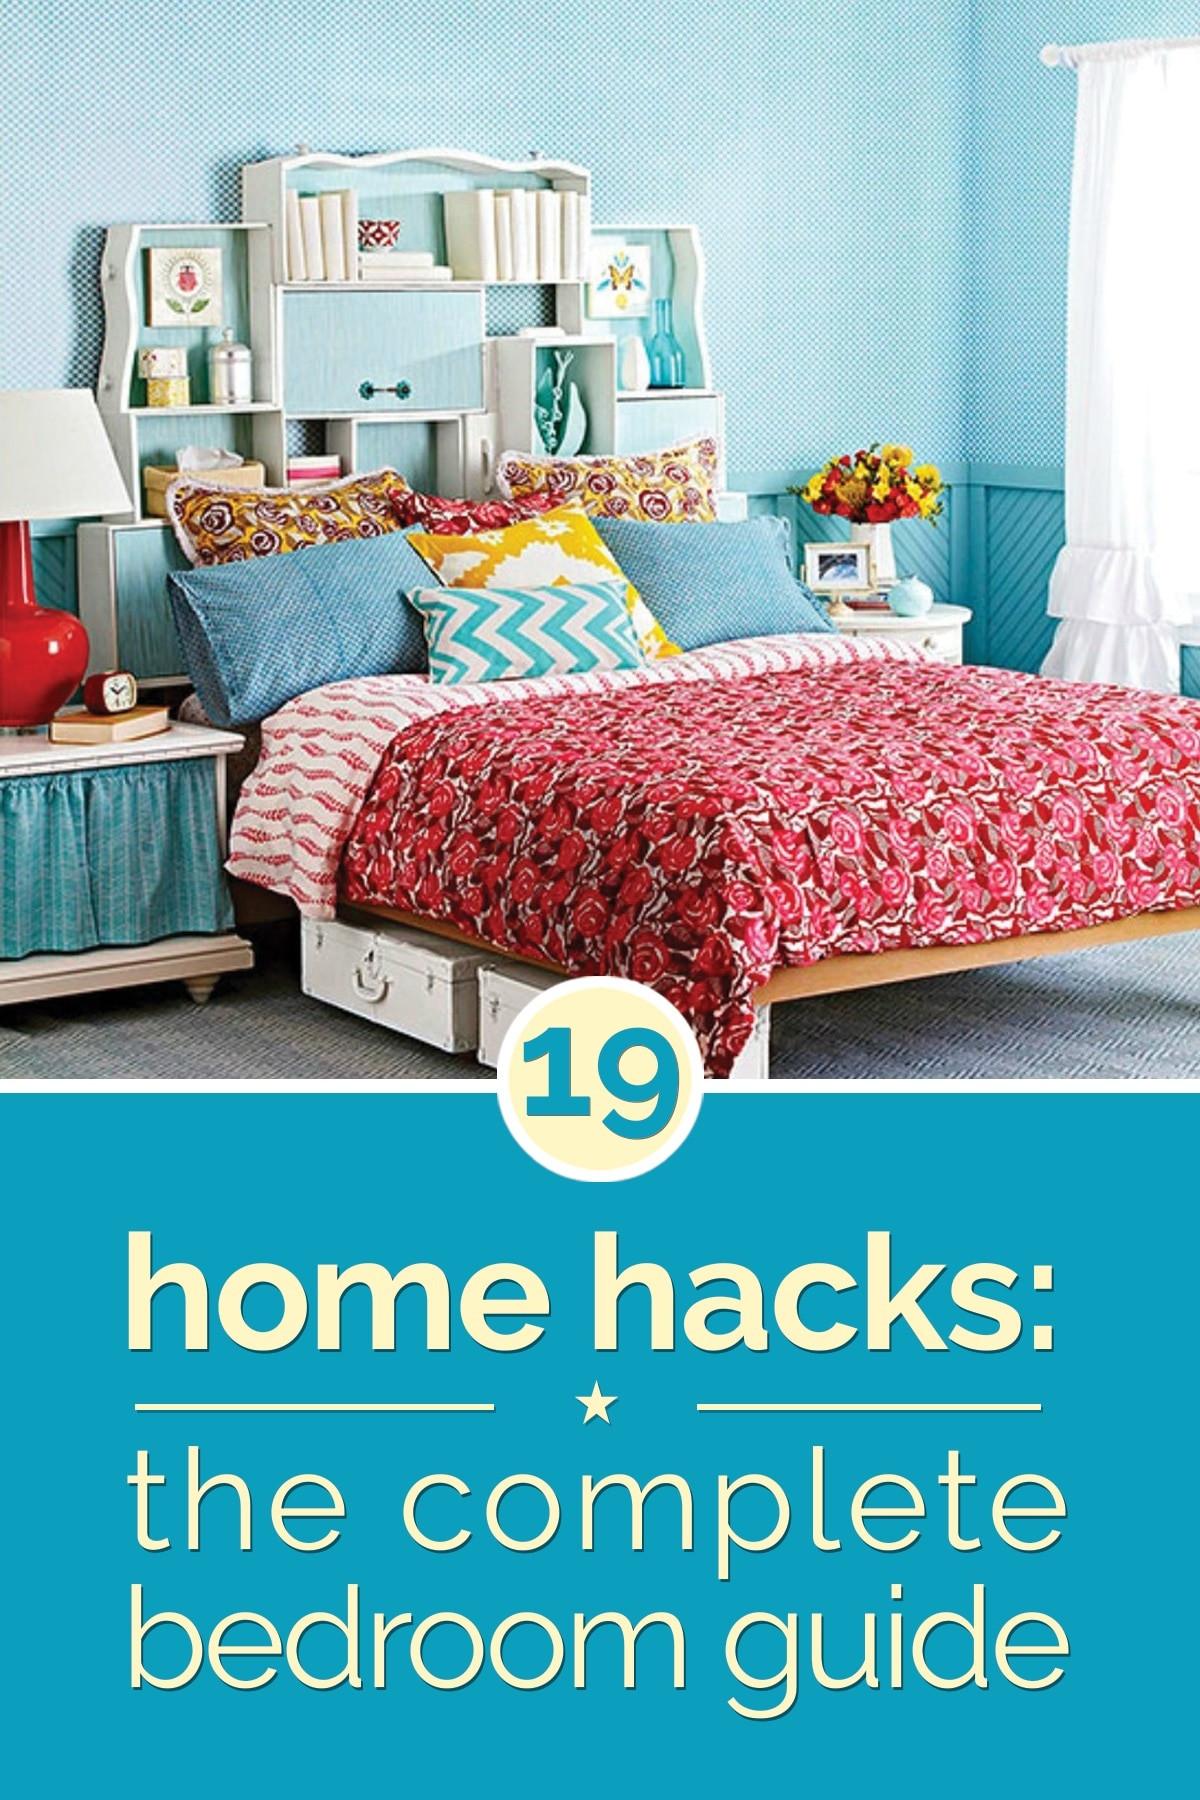 Diy Bedroom Organization  Home Hacks 19 Tips to Organize Your Bedroom thegoodstuff